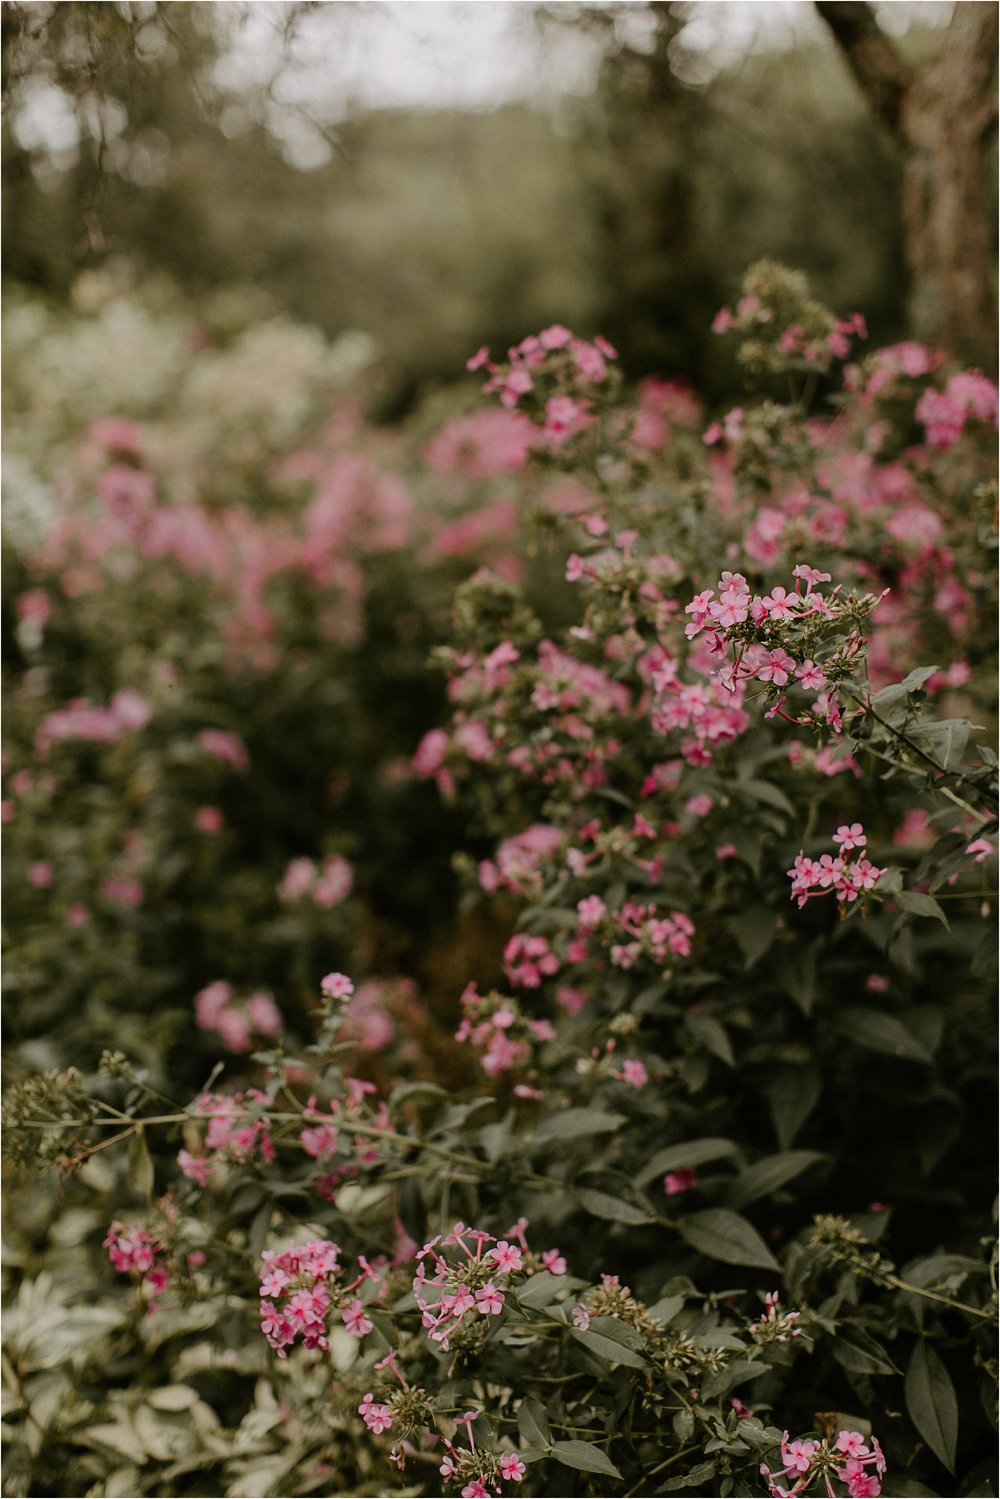 Sarah_Brookhart_Hortulus_Farm_Garden_and_Nursey_Wedding_Photographer_0015.jpg